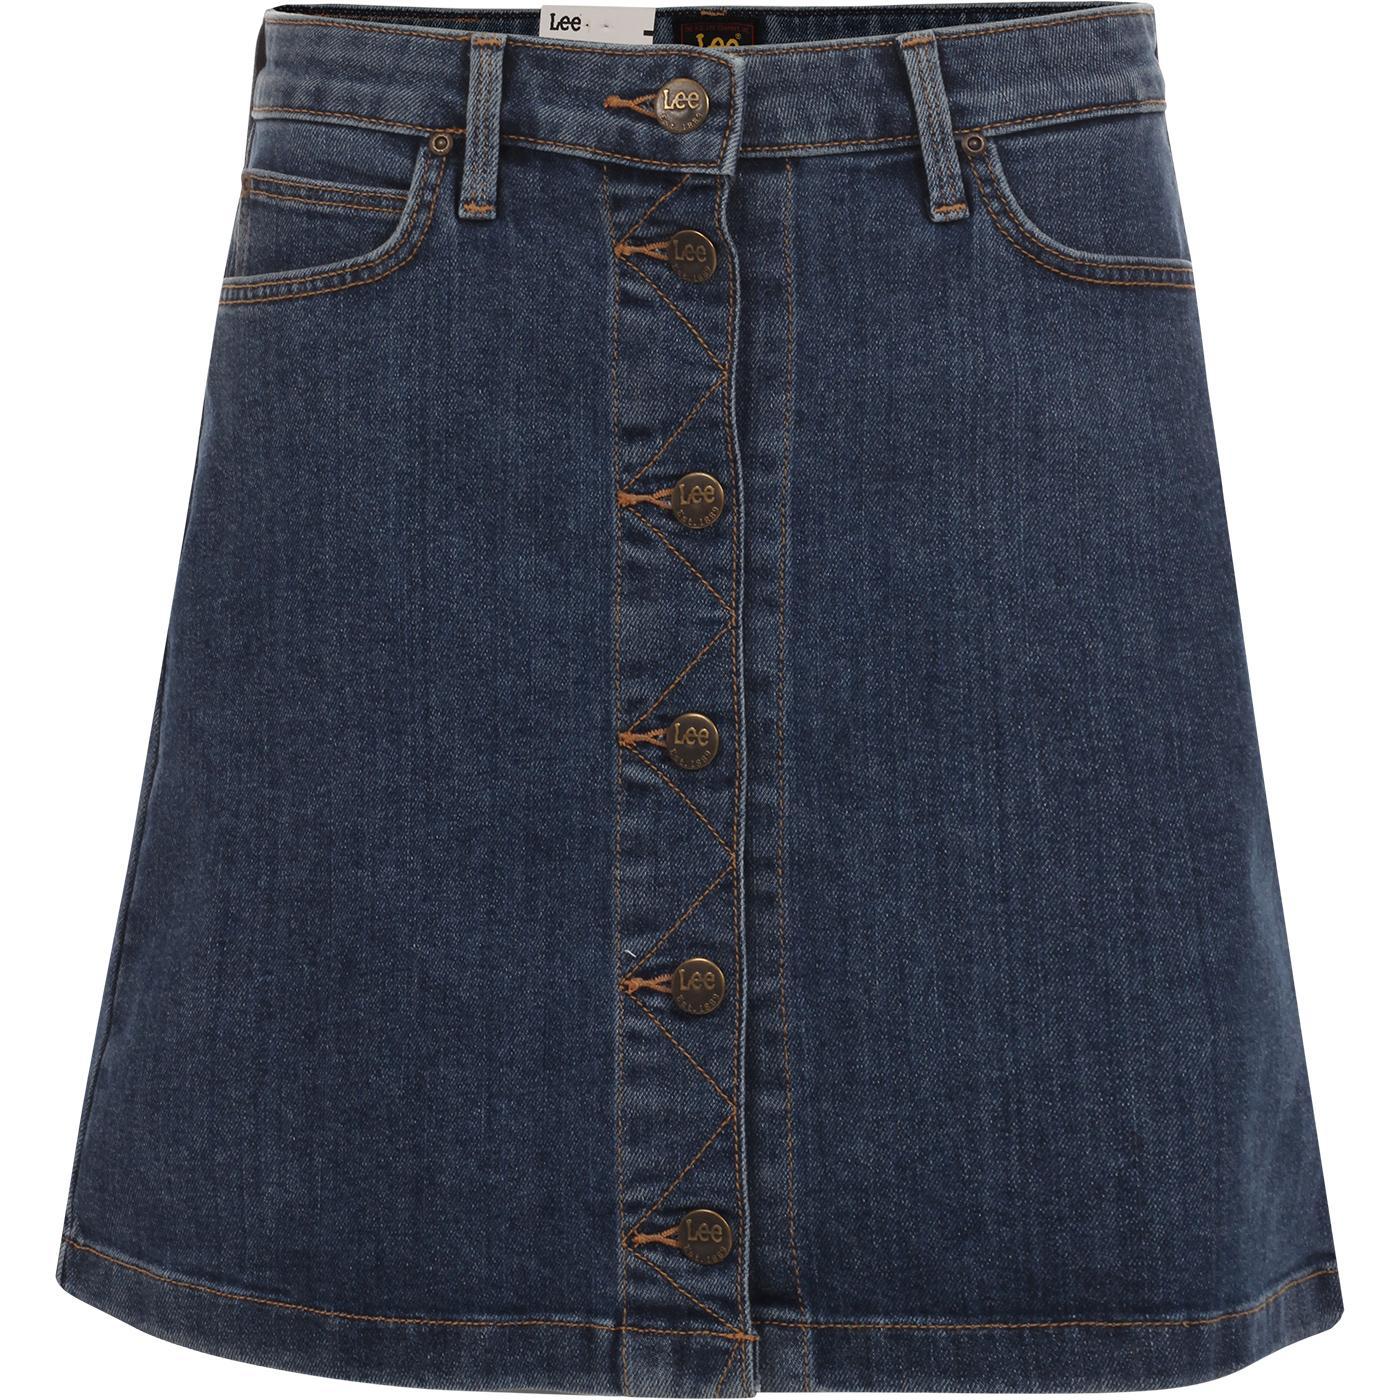 LEE Retro 1970s A-line Denim Midi Skirt (Blue)